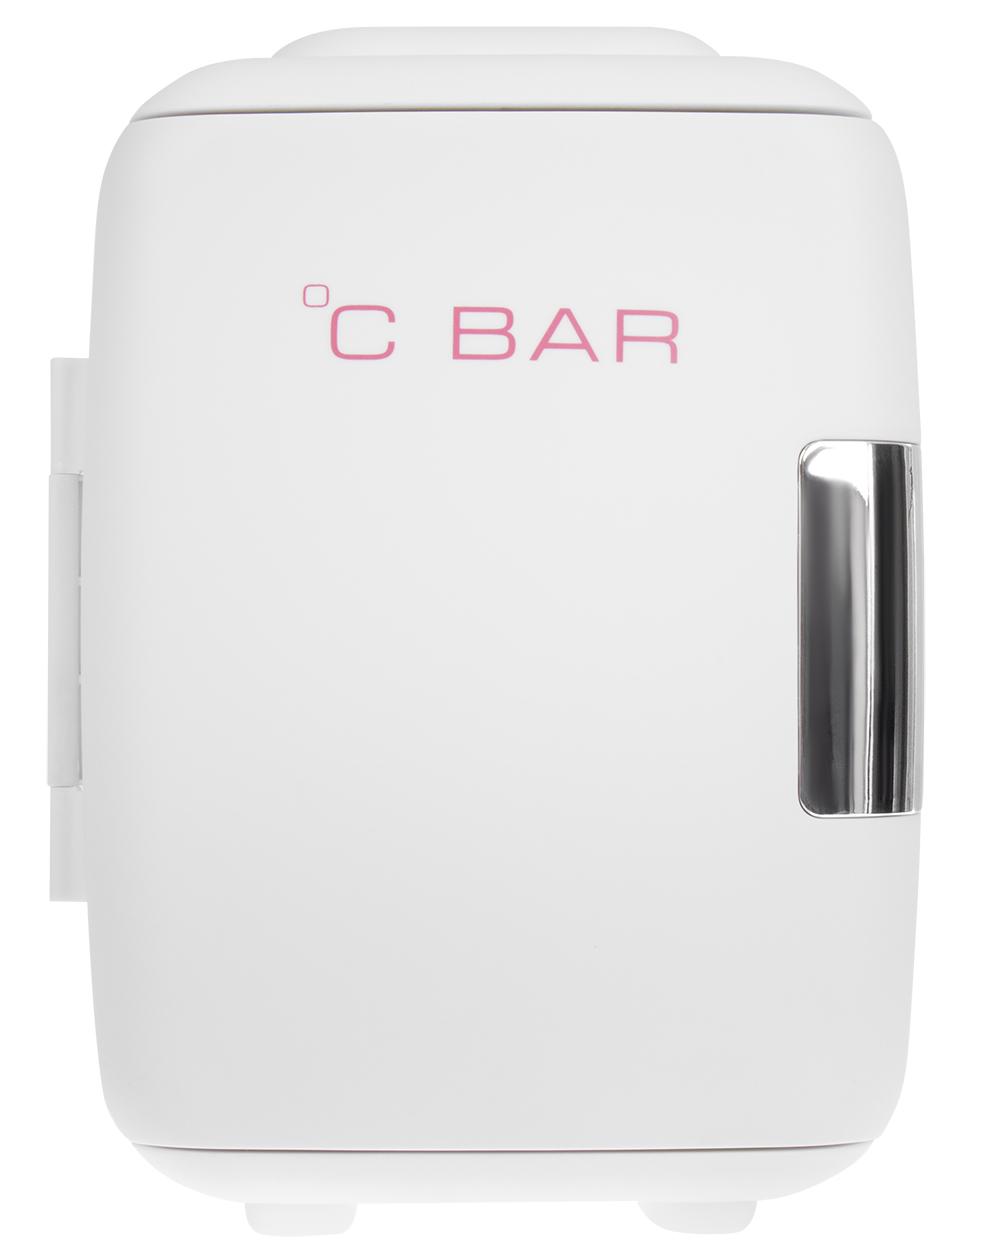 Фото - C.Bar Бьюти-холодильник белый 5 л (C.Bar, Холодильники) массажеры